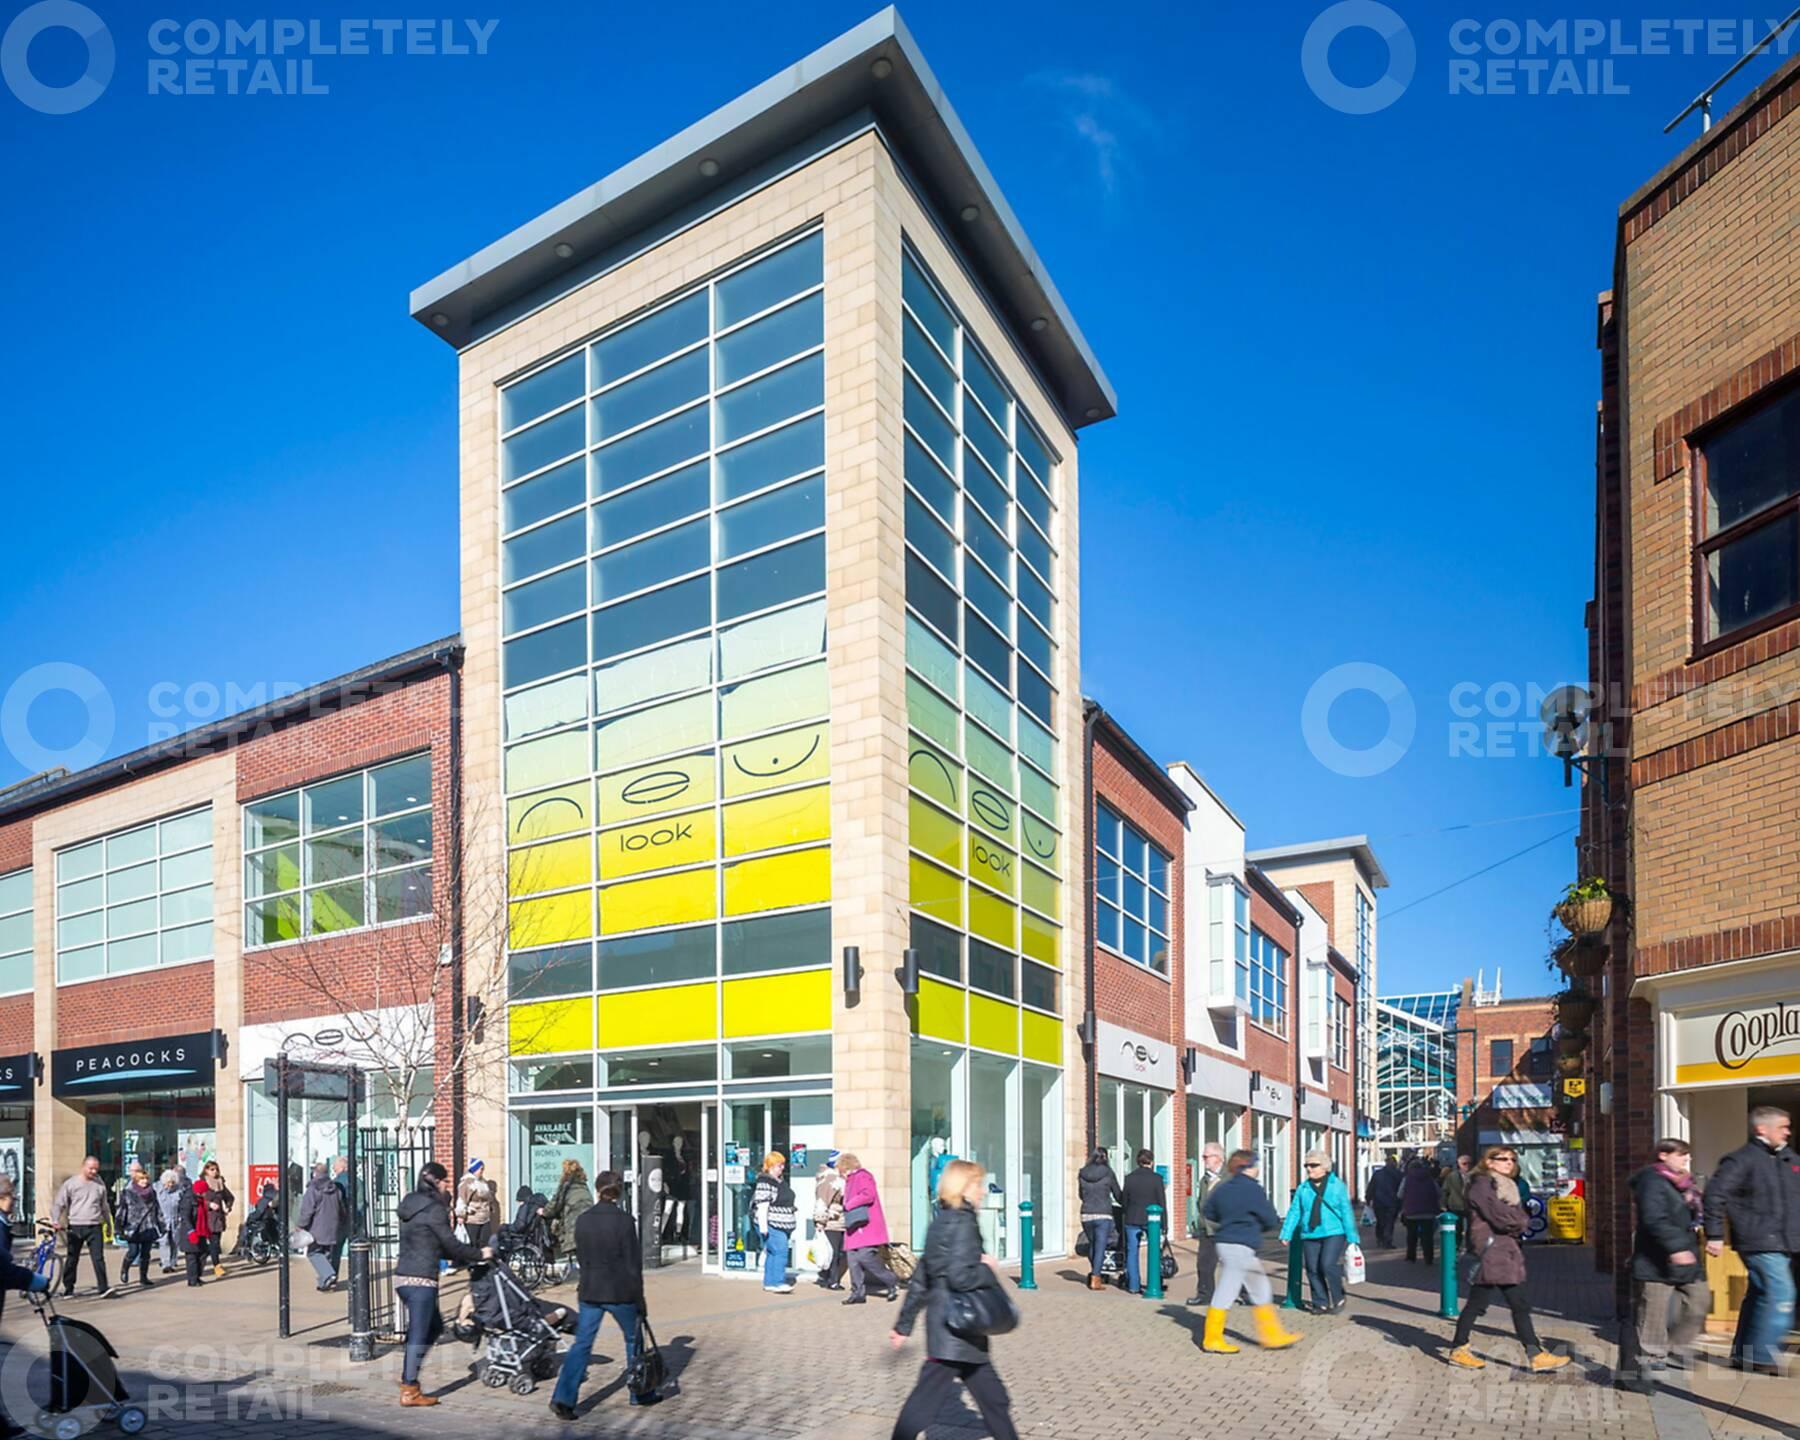 The Promenades Shopping Centre